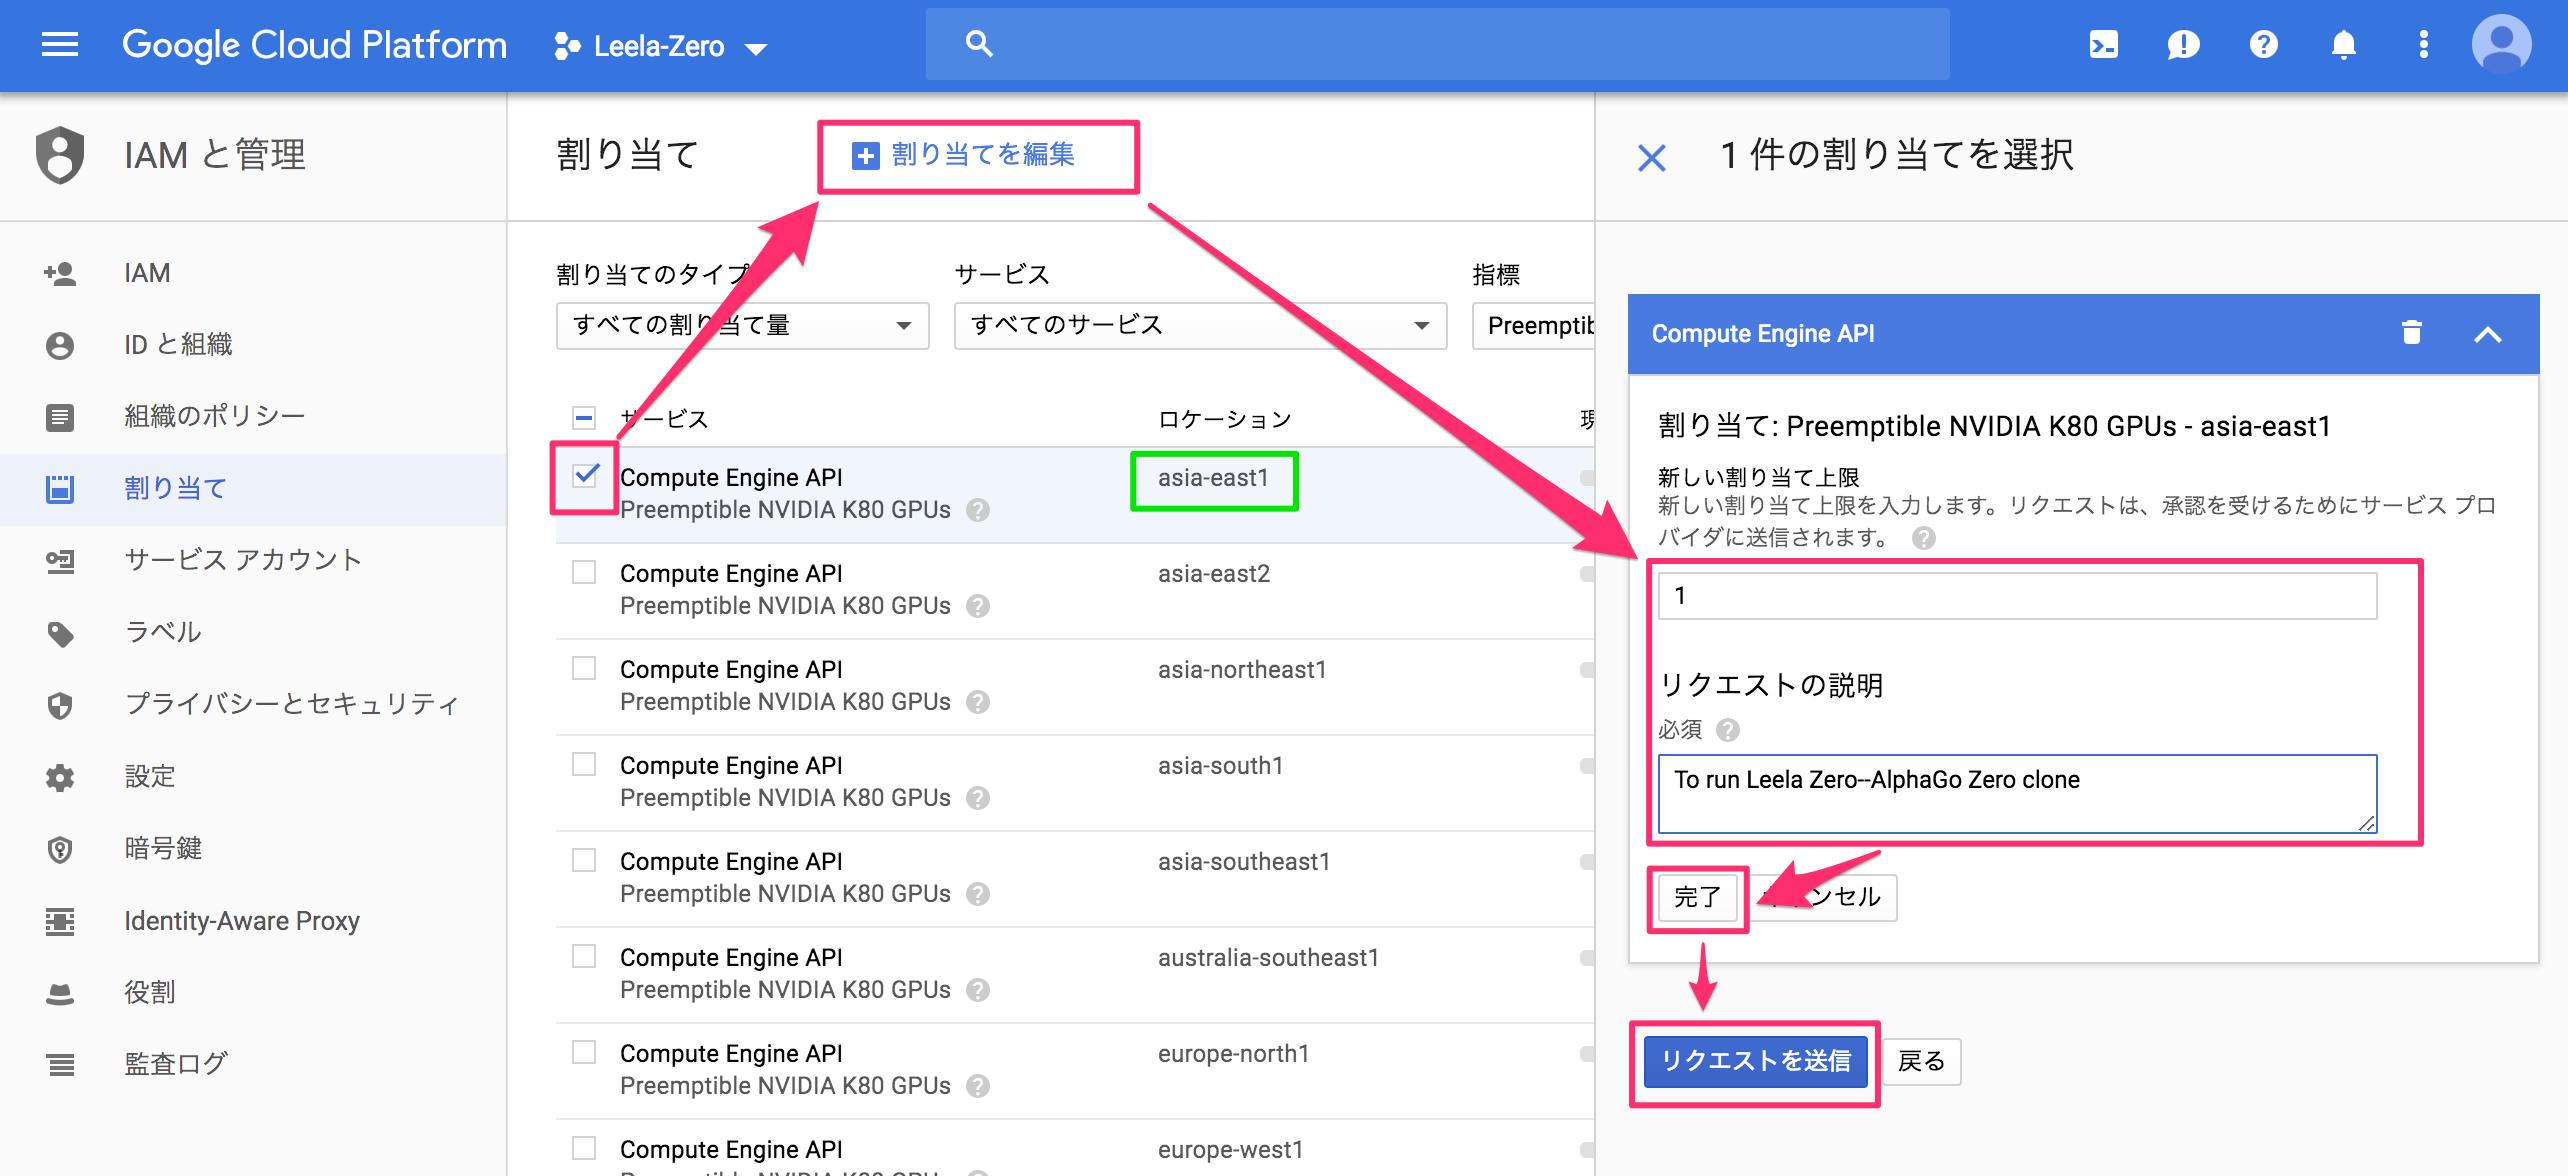 IAM_と管理_-_Leela-Zero_-_Google_Cloud_Platform.png